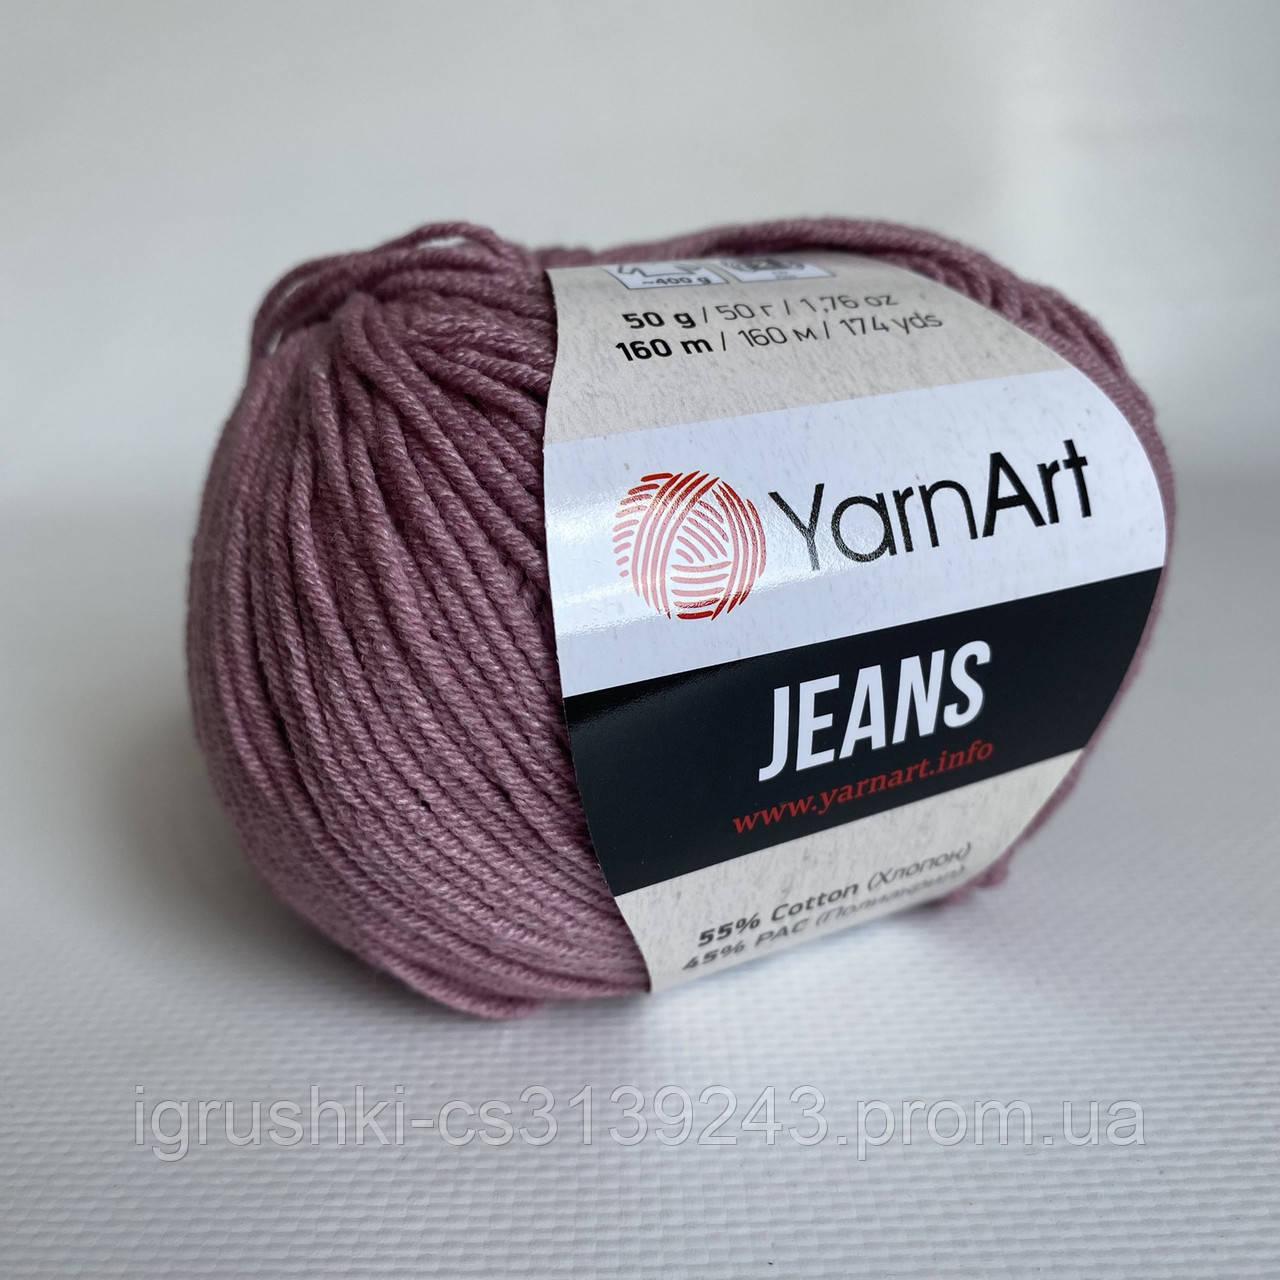 YarnArt Jeans (ярнарт джинс) 83 Пильна троянда